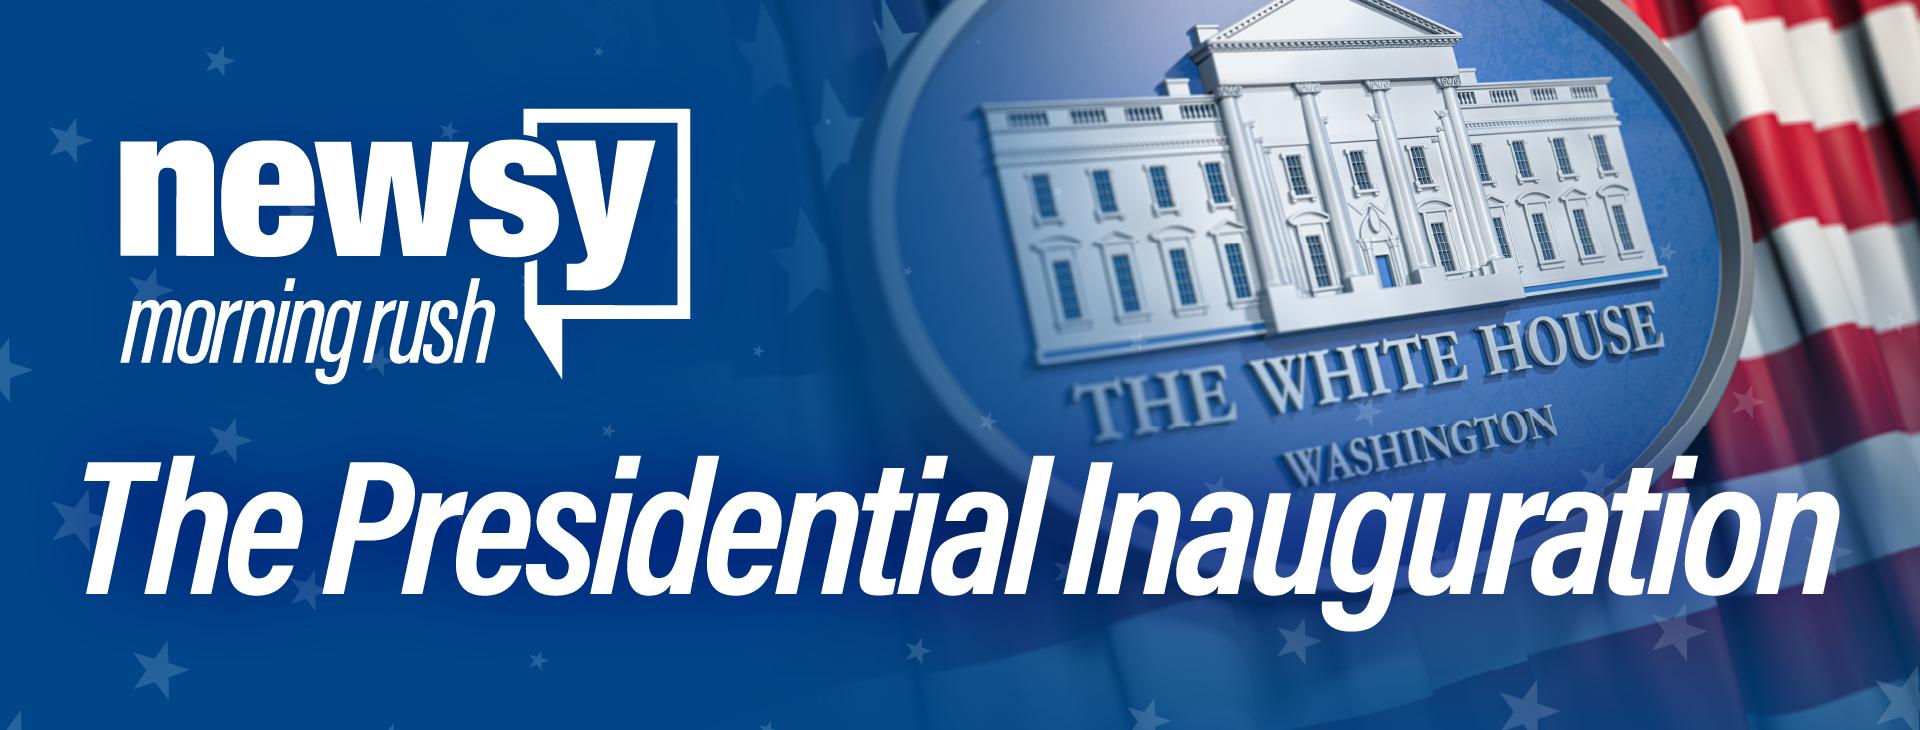 Morning Rush: The Presidential Inauguration